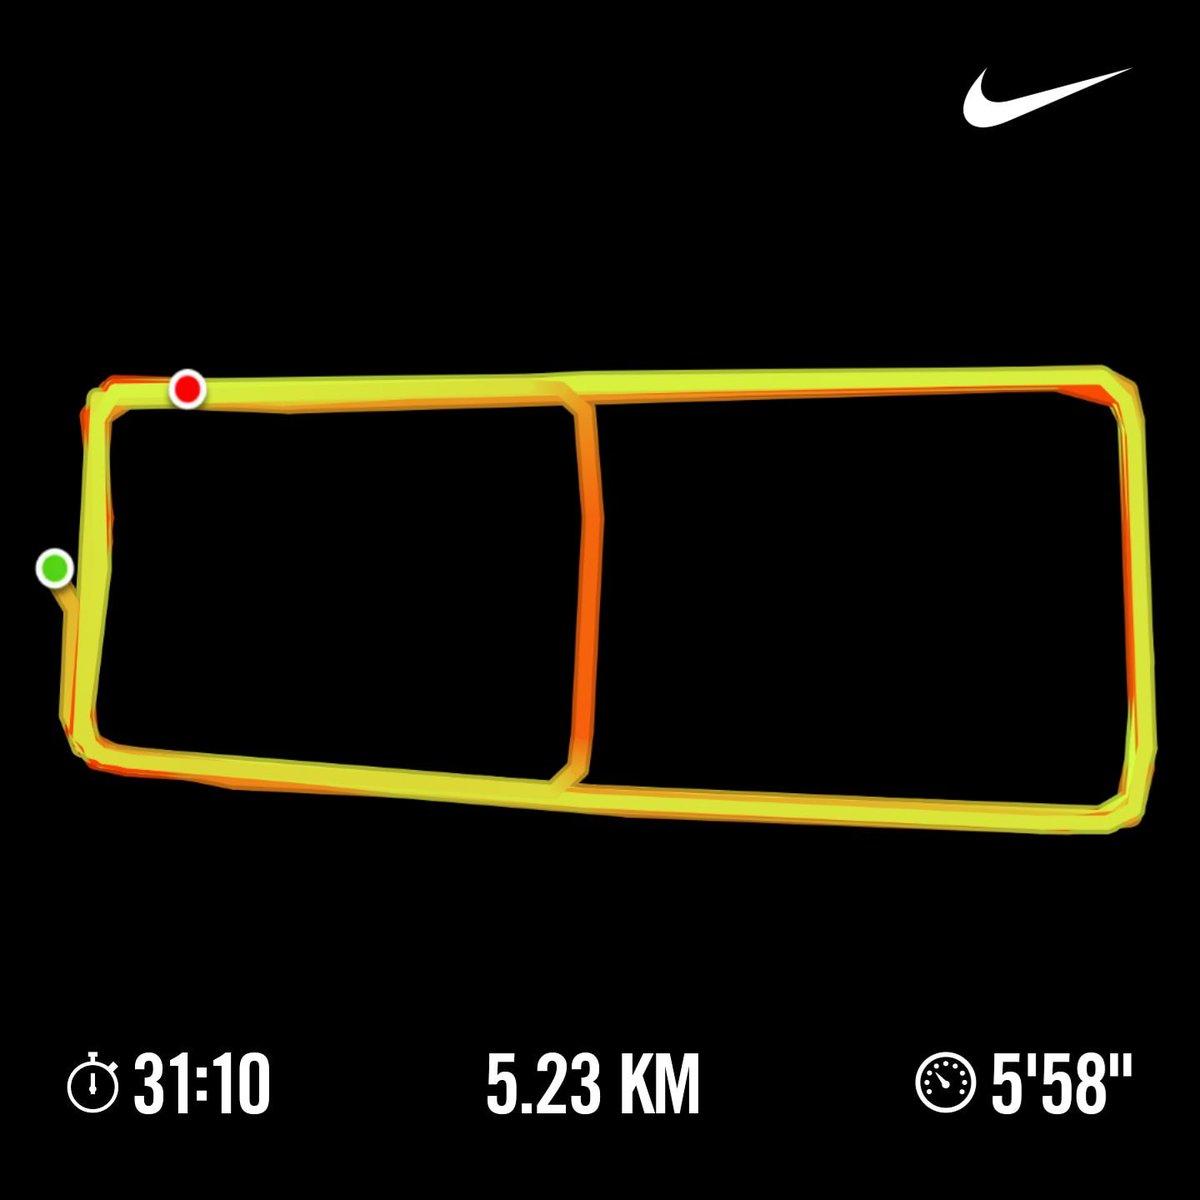 5.23km grind   Keep moving  #naijaFittest #runner #nikeplus #fitfam #strava #GoogleFit #itsAmarathon #ItsALifestyle #IamAccountable #yourturn   🇳🇬🏃♂️💪🔥😜✅